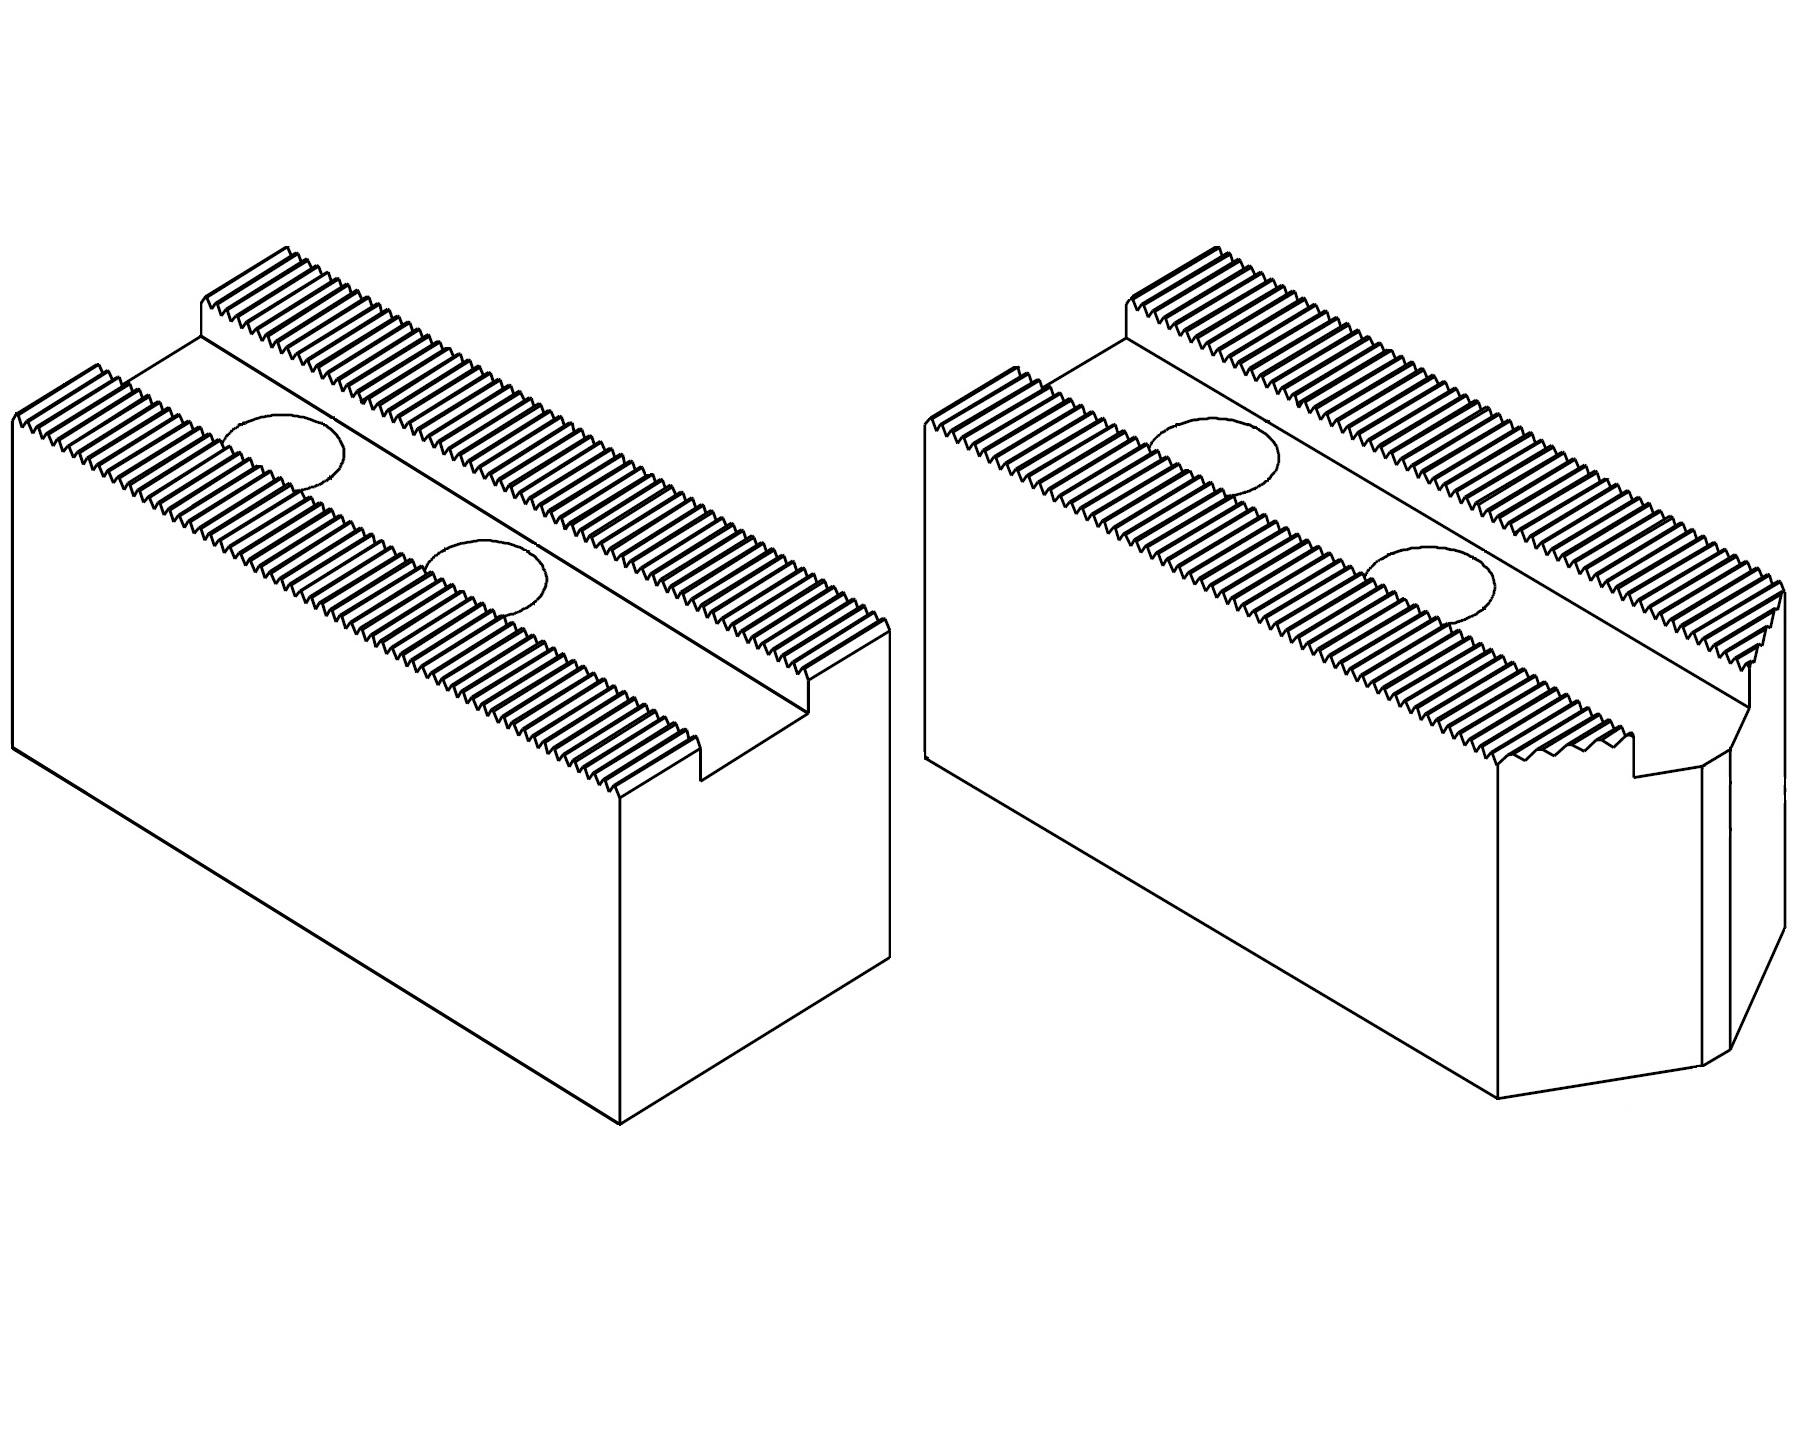 "Čelisti měkké 1/16""x90°, šířka drážky - 25,5 (sklíčidla pr. 250 - 400 mm)"